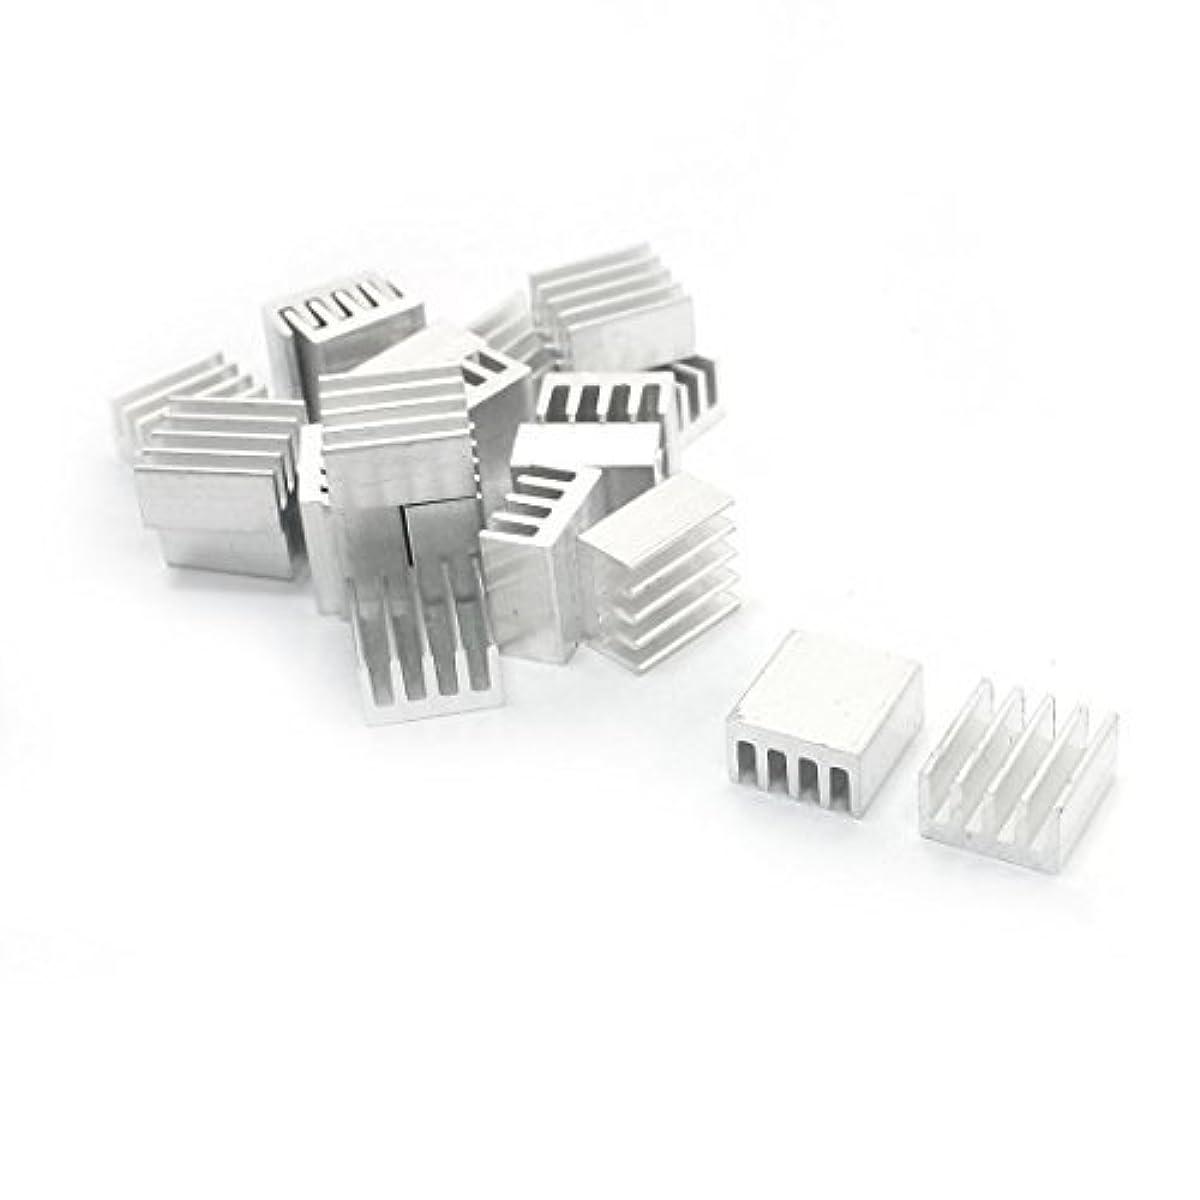 DealMux 20 Pcs Aluminium Heat Diffuse Heatsink Cooling Fin 9mm x 9mm x 5mm